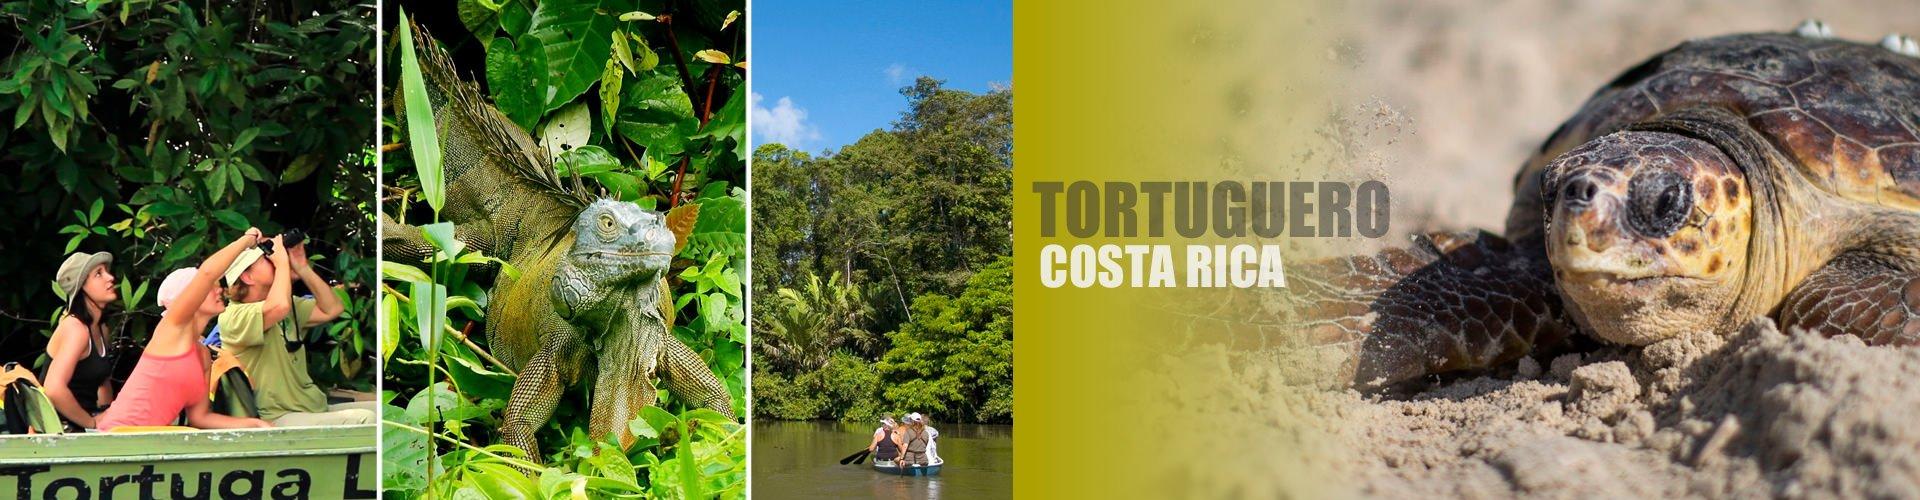 Tortuguero Excursions